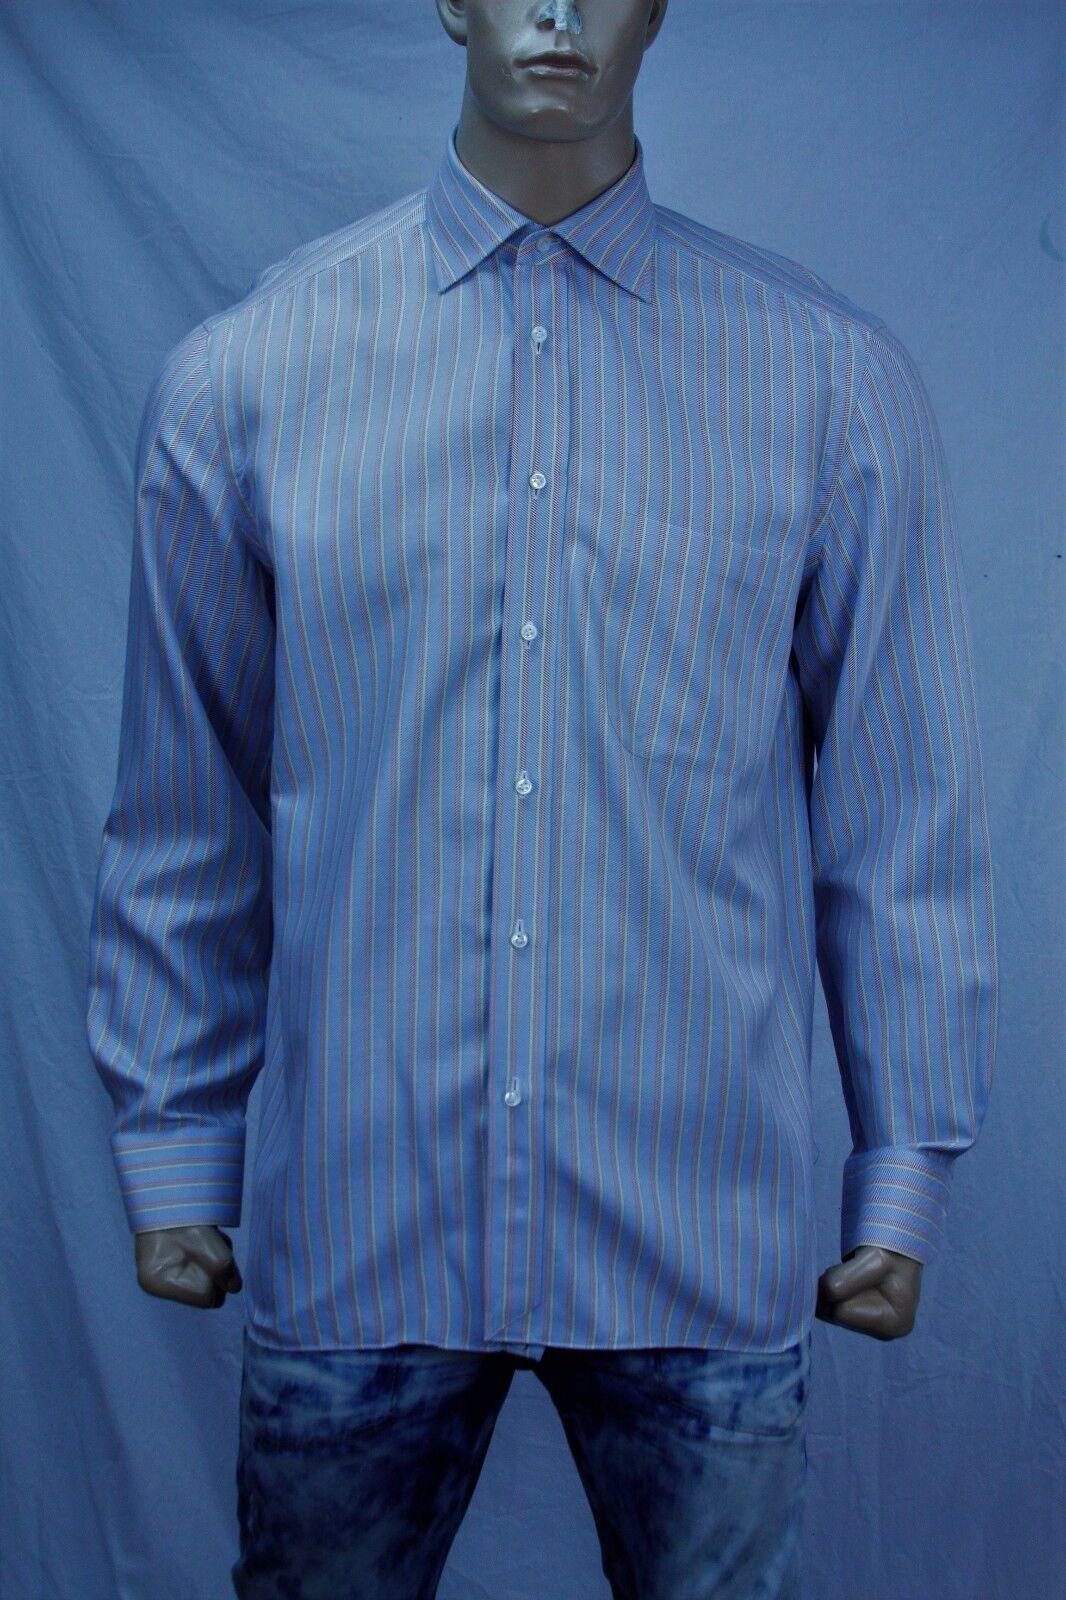 Authentic Borrelli Napoli Men's striped cotton dress shirts US 16 Made in .